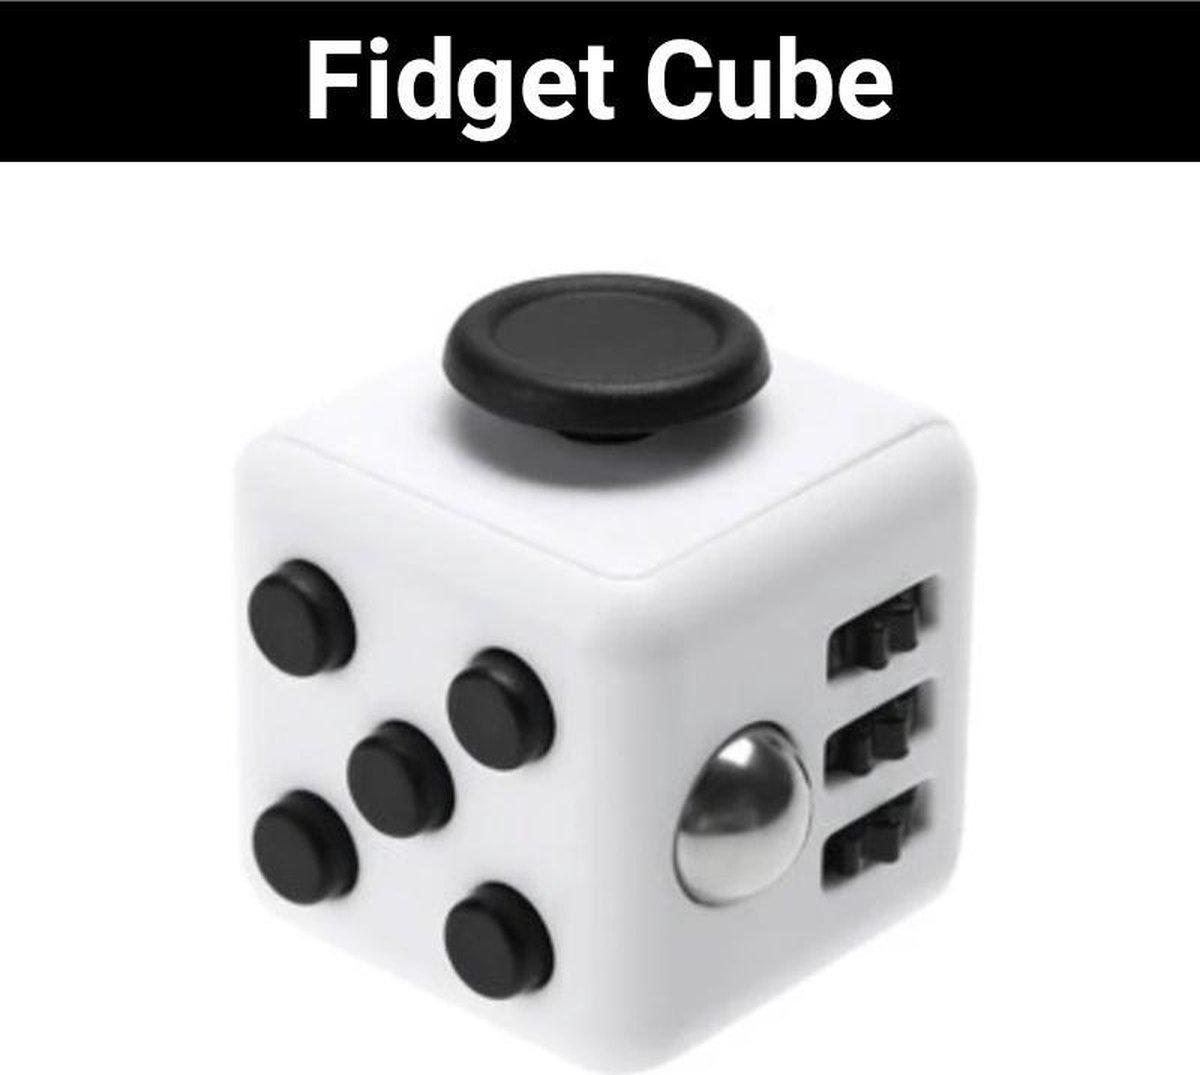 "Fidget Cube ""Wit-Zwart"" - Friemel Speelgoed - Anti Stress - Hooggevoeligheid - Hoogsensitiviteit Kinderen"